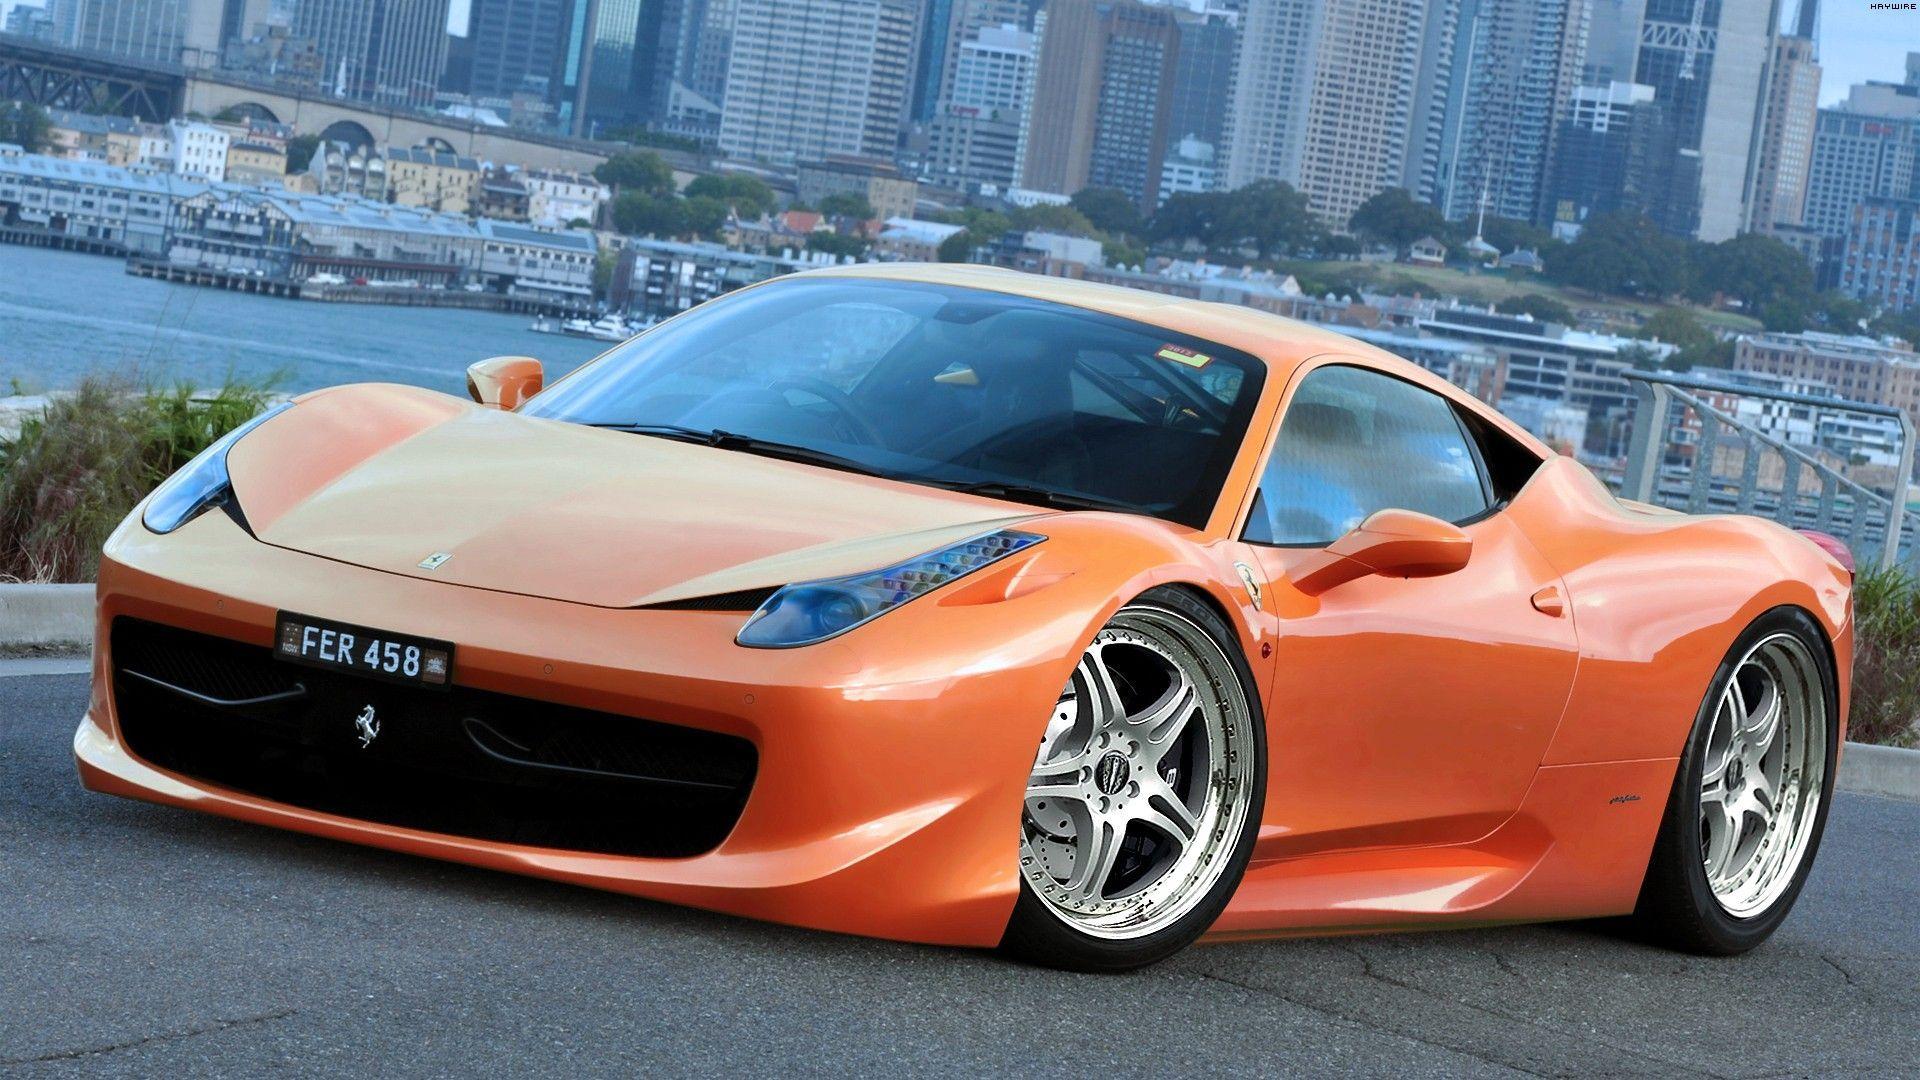 ferrari car hd wallpapers 1080p 330277 Ferrari 458